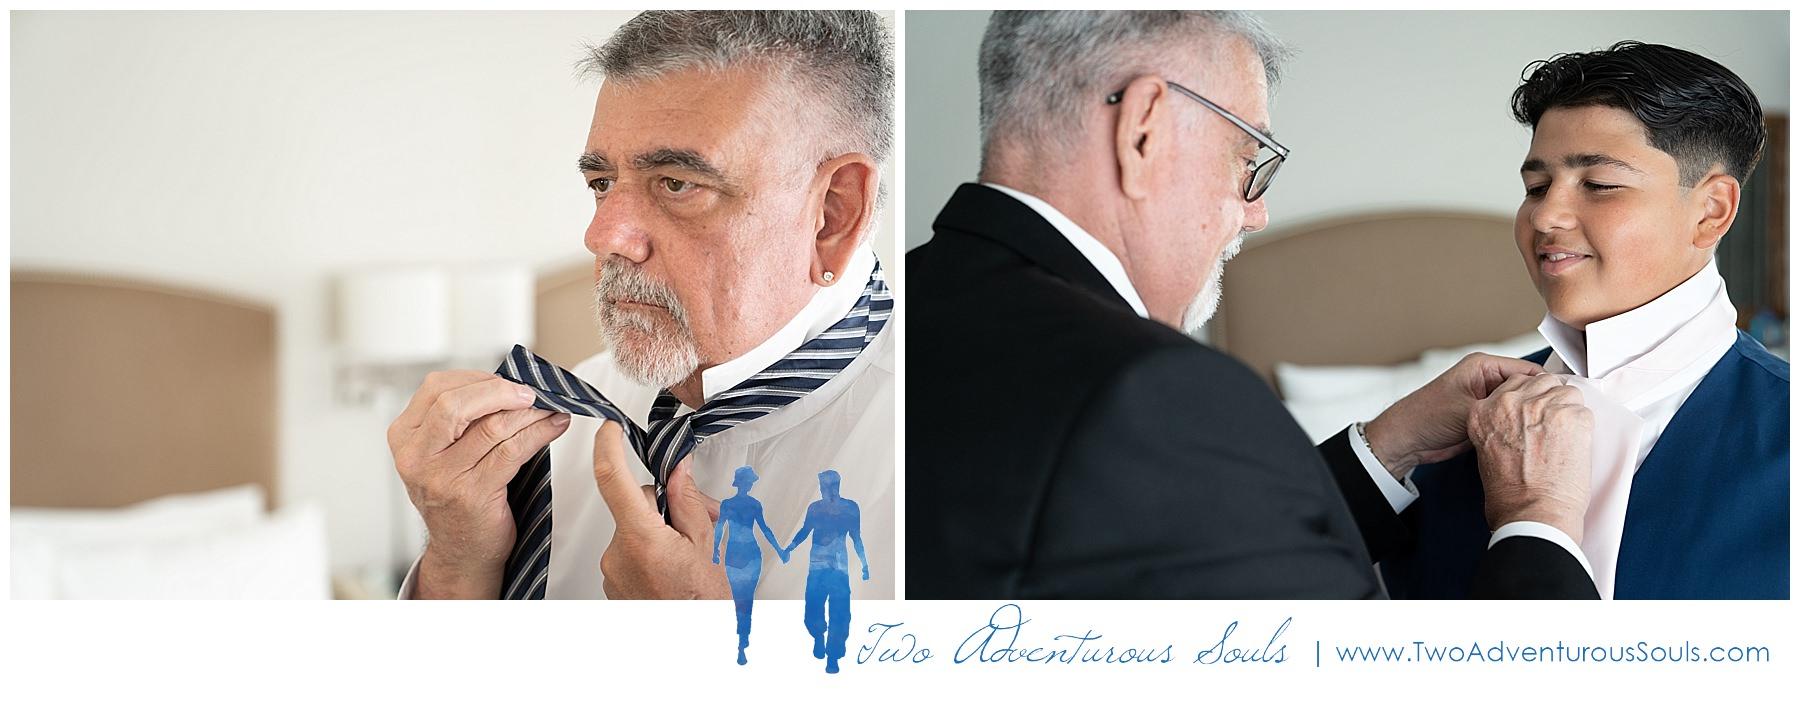 Connecticut Wedding Photographers, Lace Factory Wedding Photographers, Two Adventurous Souls - 083119_0007.jpg